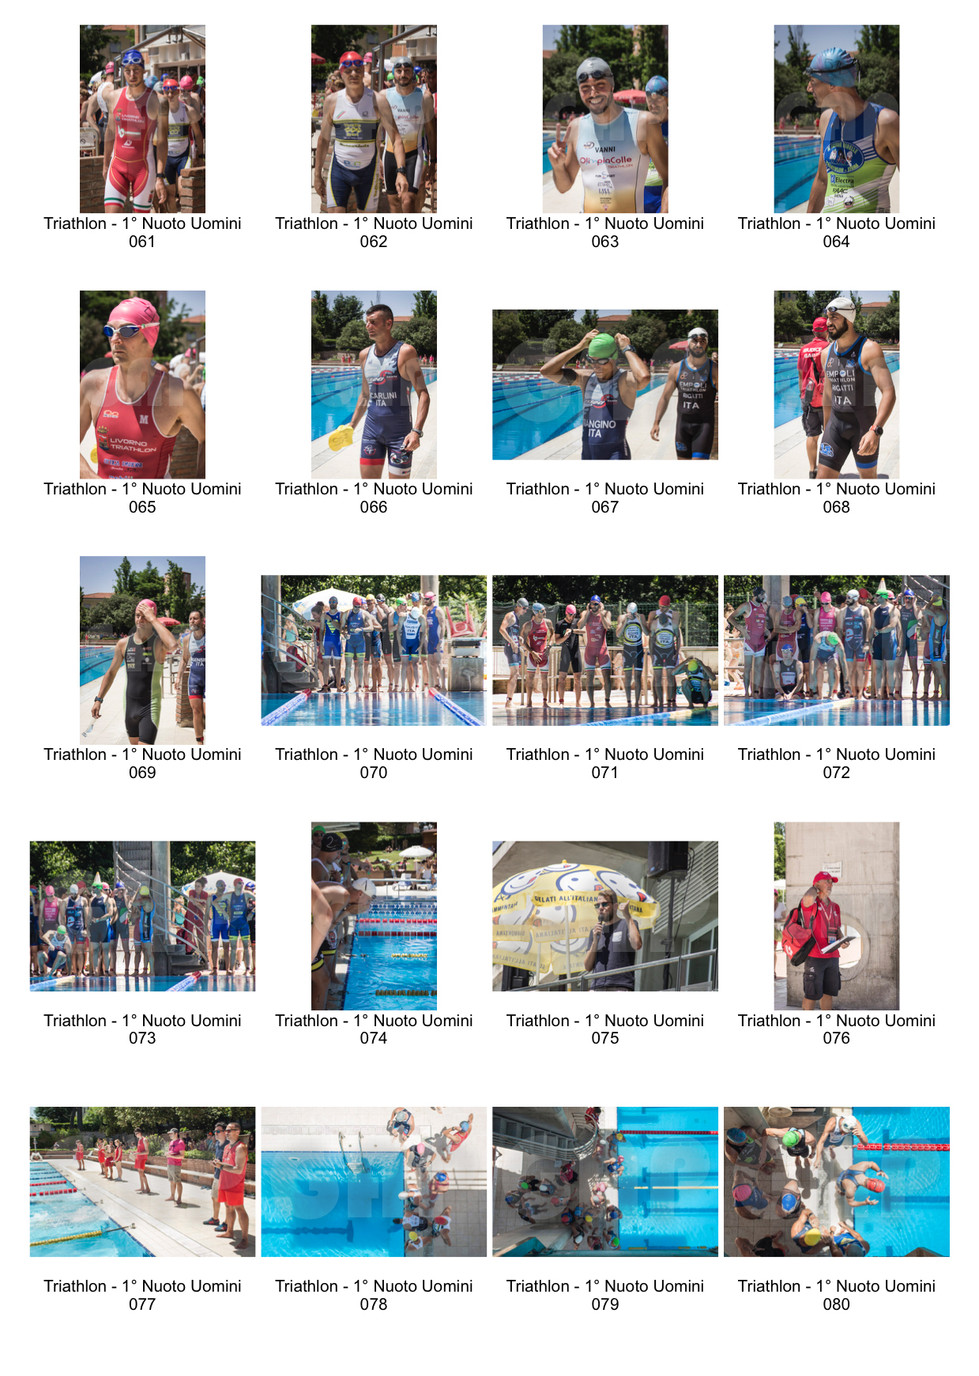 Triathlon_V.Elsa_-_1°_Frazione_Nuoto_Uomini_-04.jpg